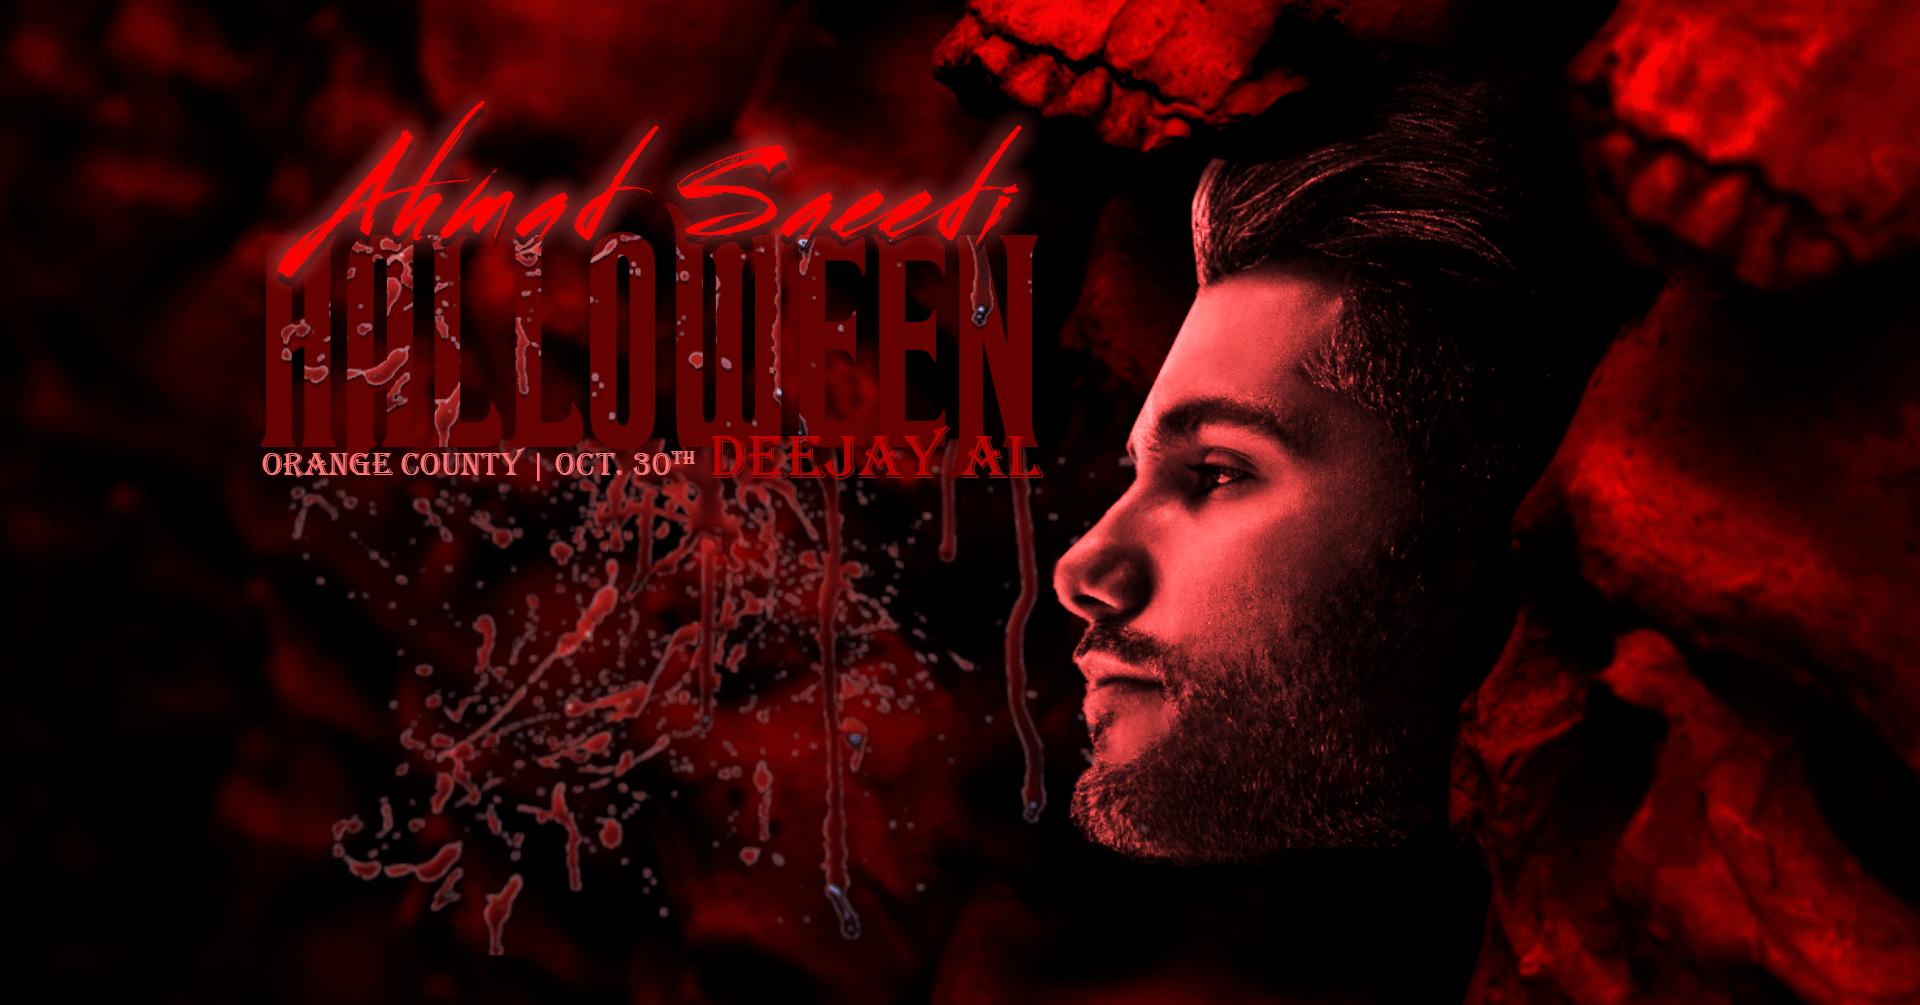 People-App-Ahmad-Saeedi-Halloween-OCPC-Deejay-AL-Orange-County-Revised